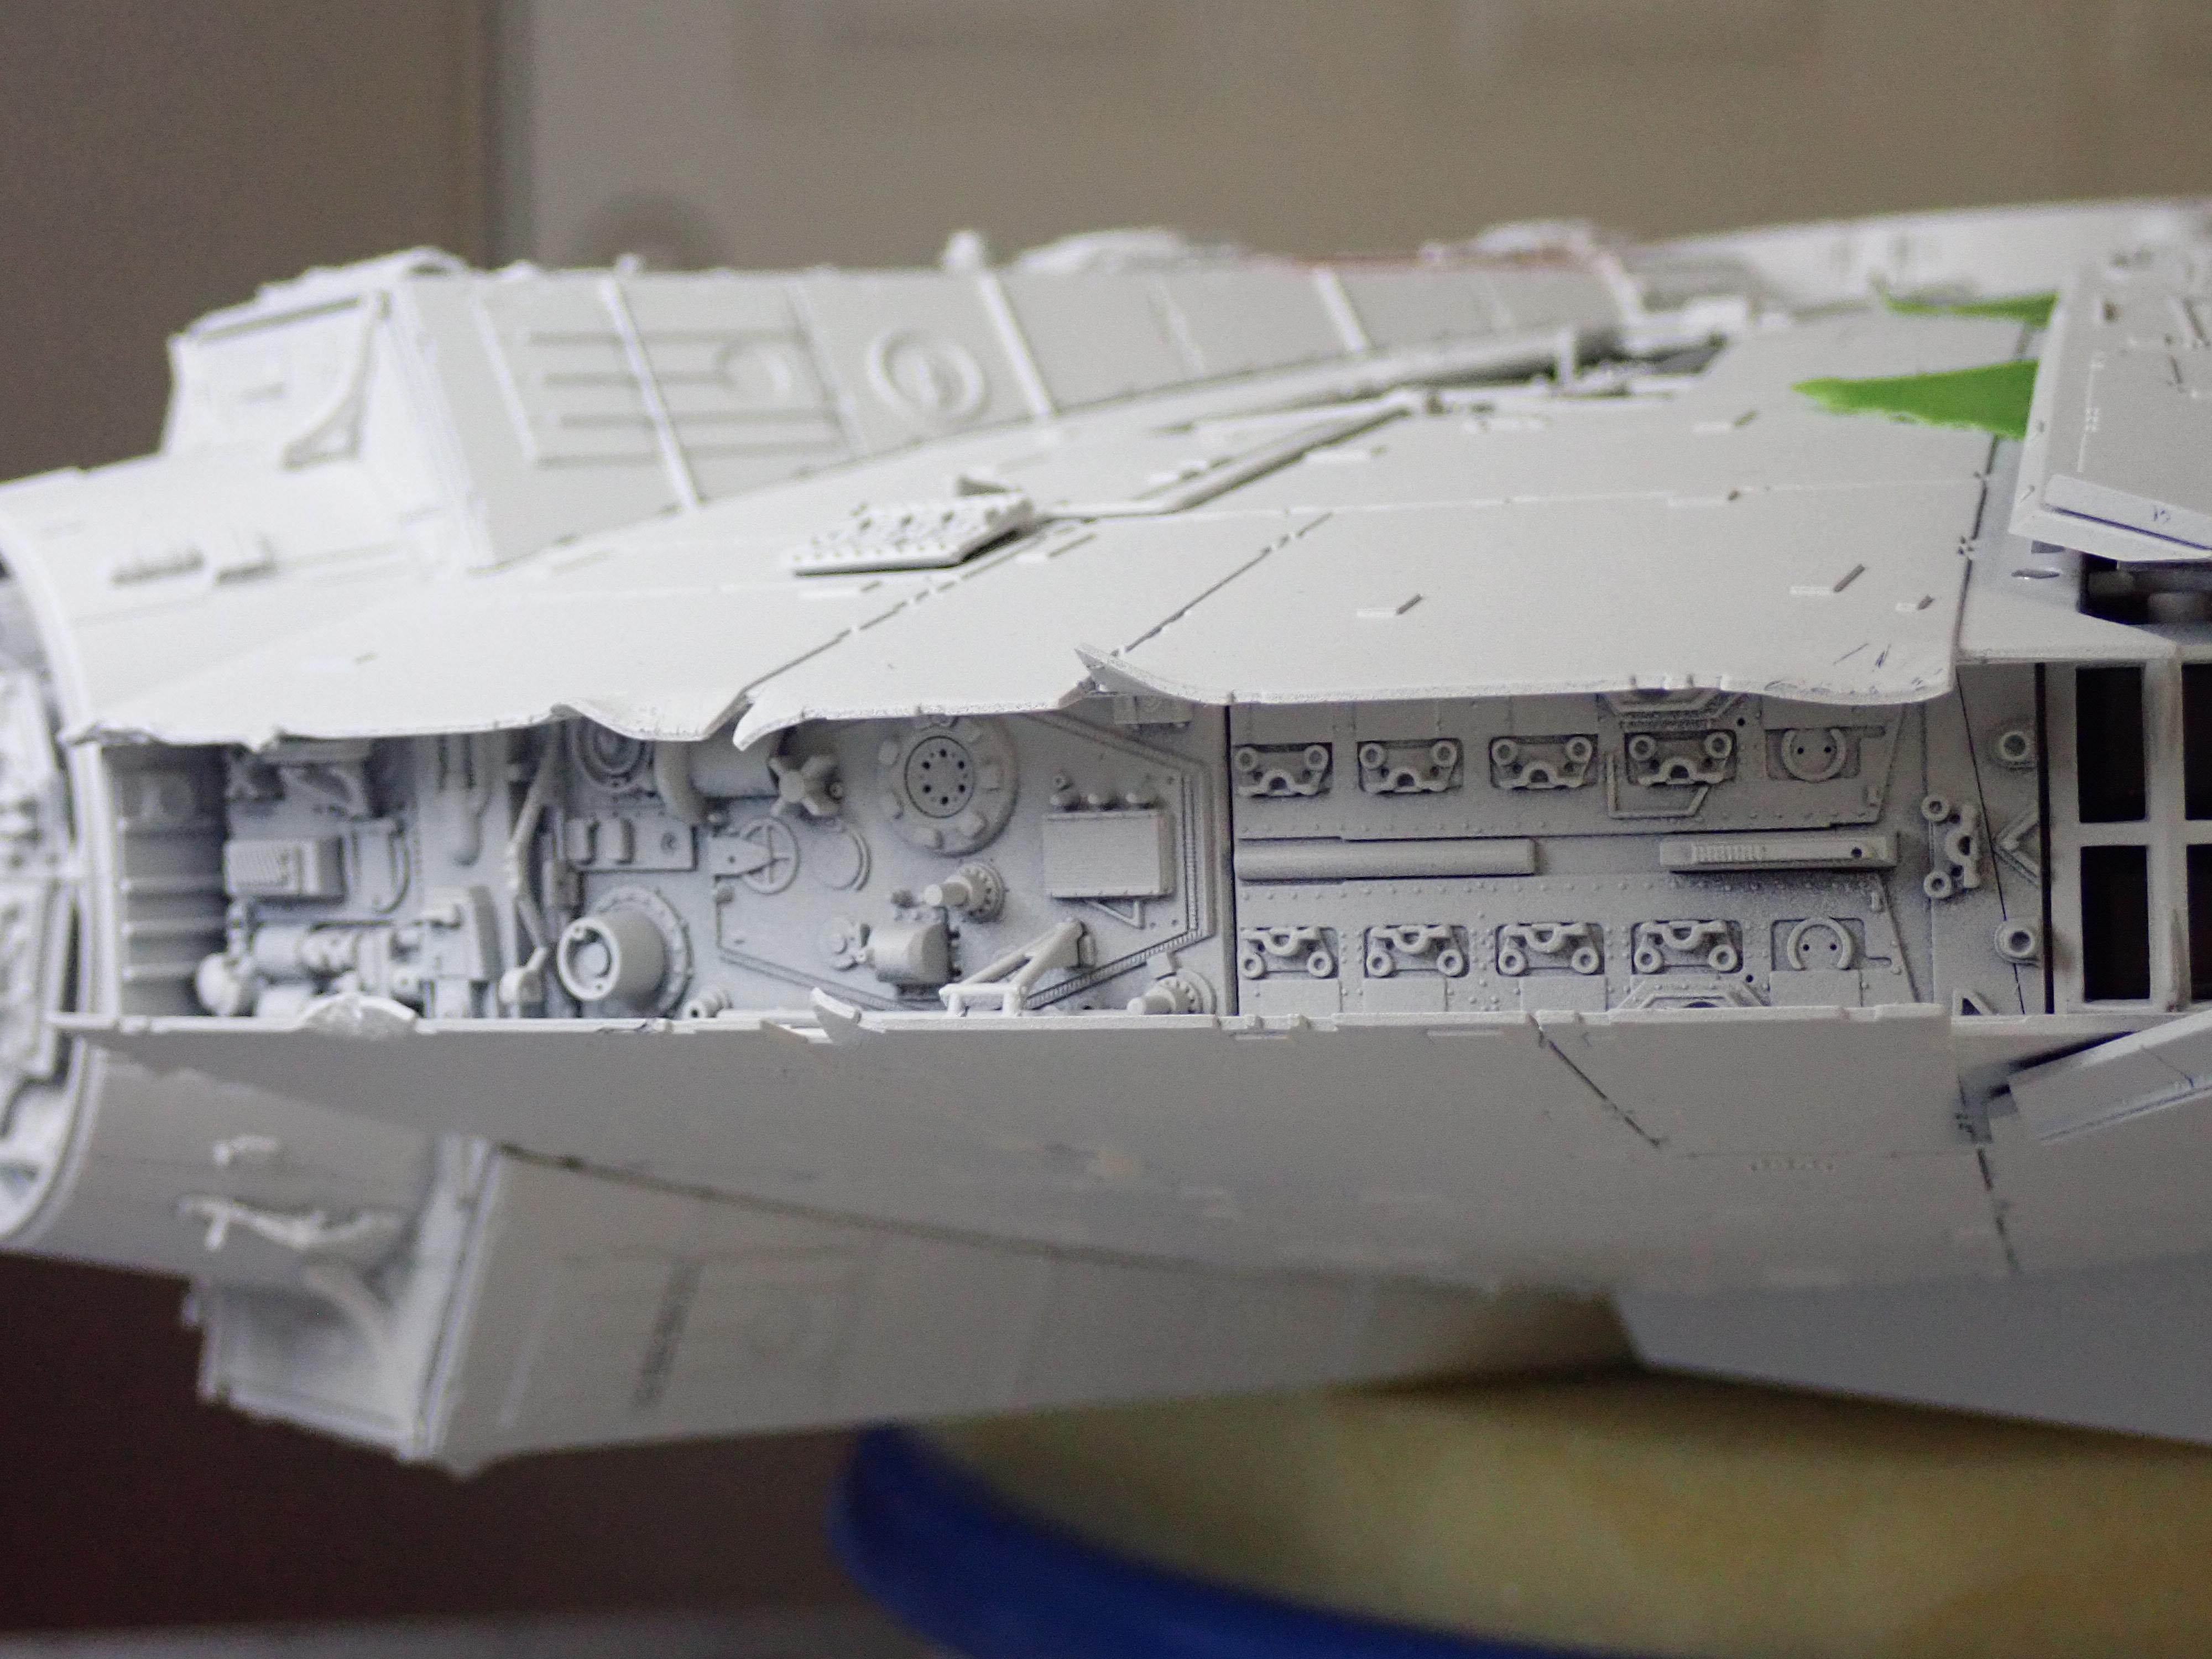 72 Damage 02, port rear.JPG